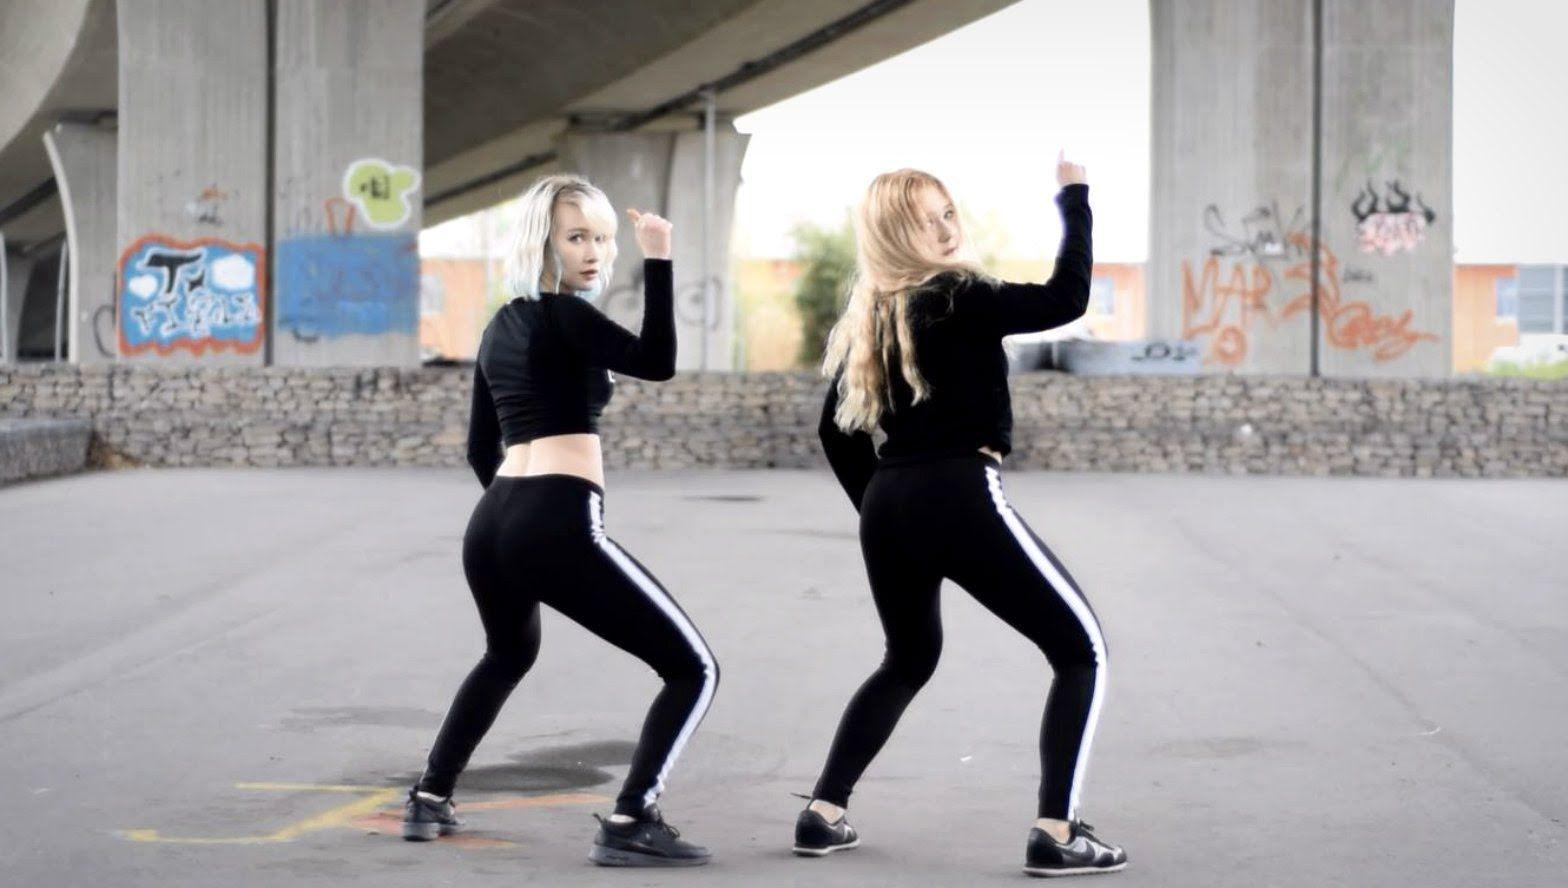 Brave Girls (브레이브걸스) - Deepened (변했어) Dance Cover by HBK